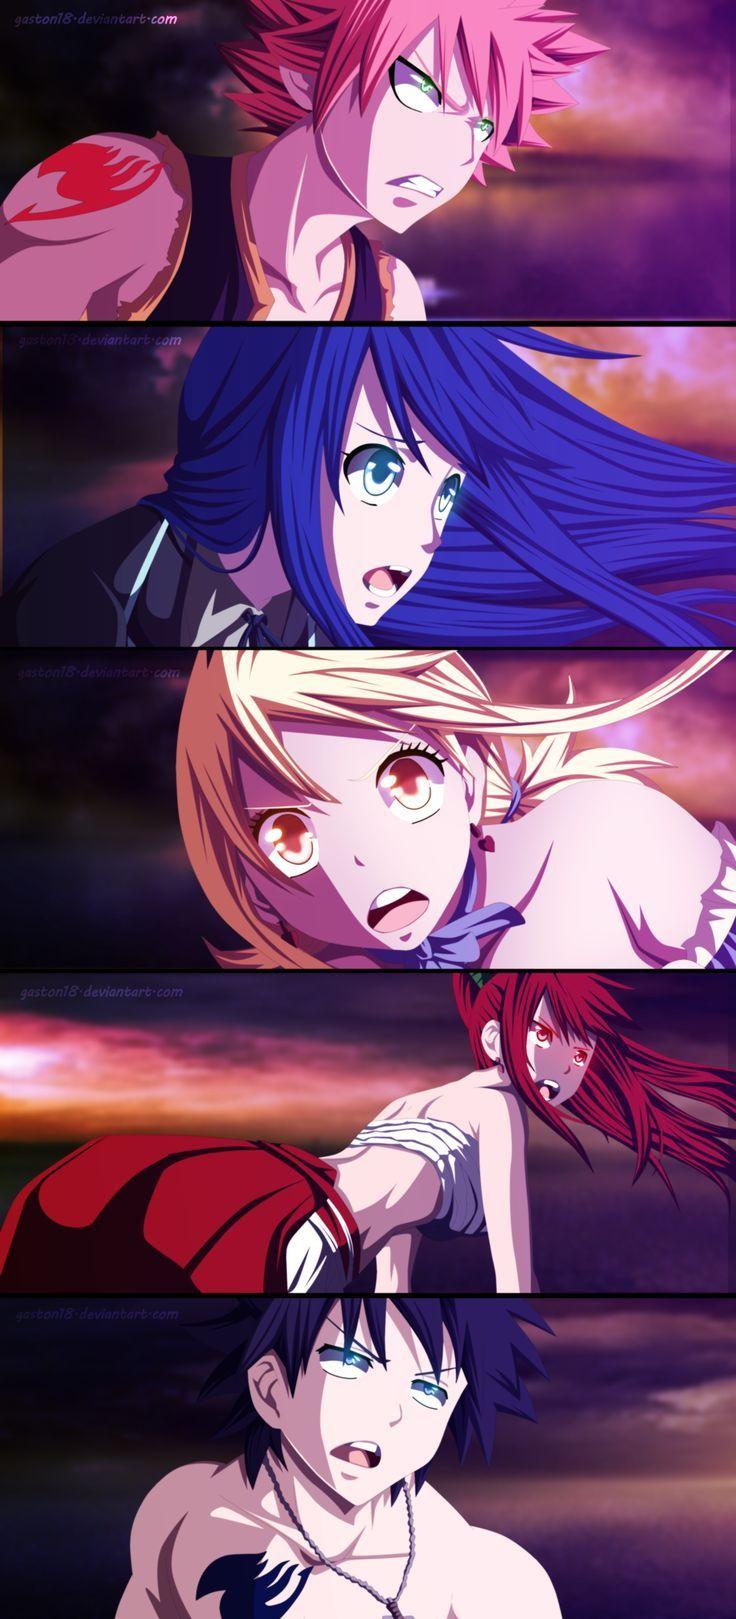 Natsu, Wendy, Lucy, Erza, Gray | Fairy tale anime, Fairy ...